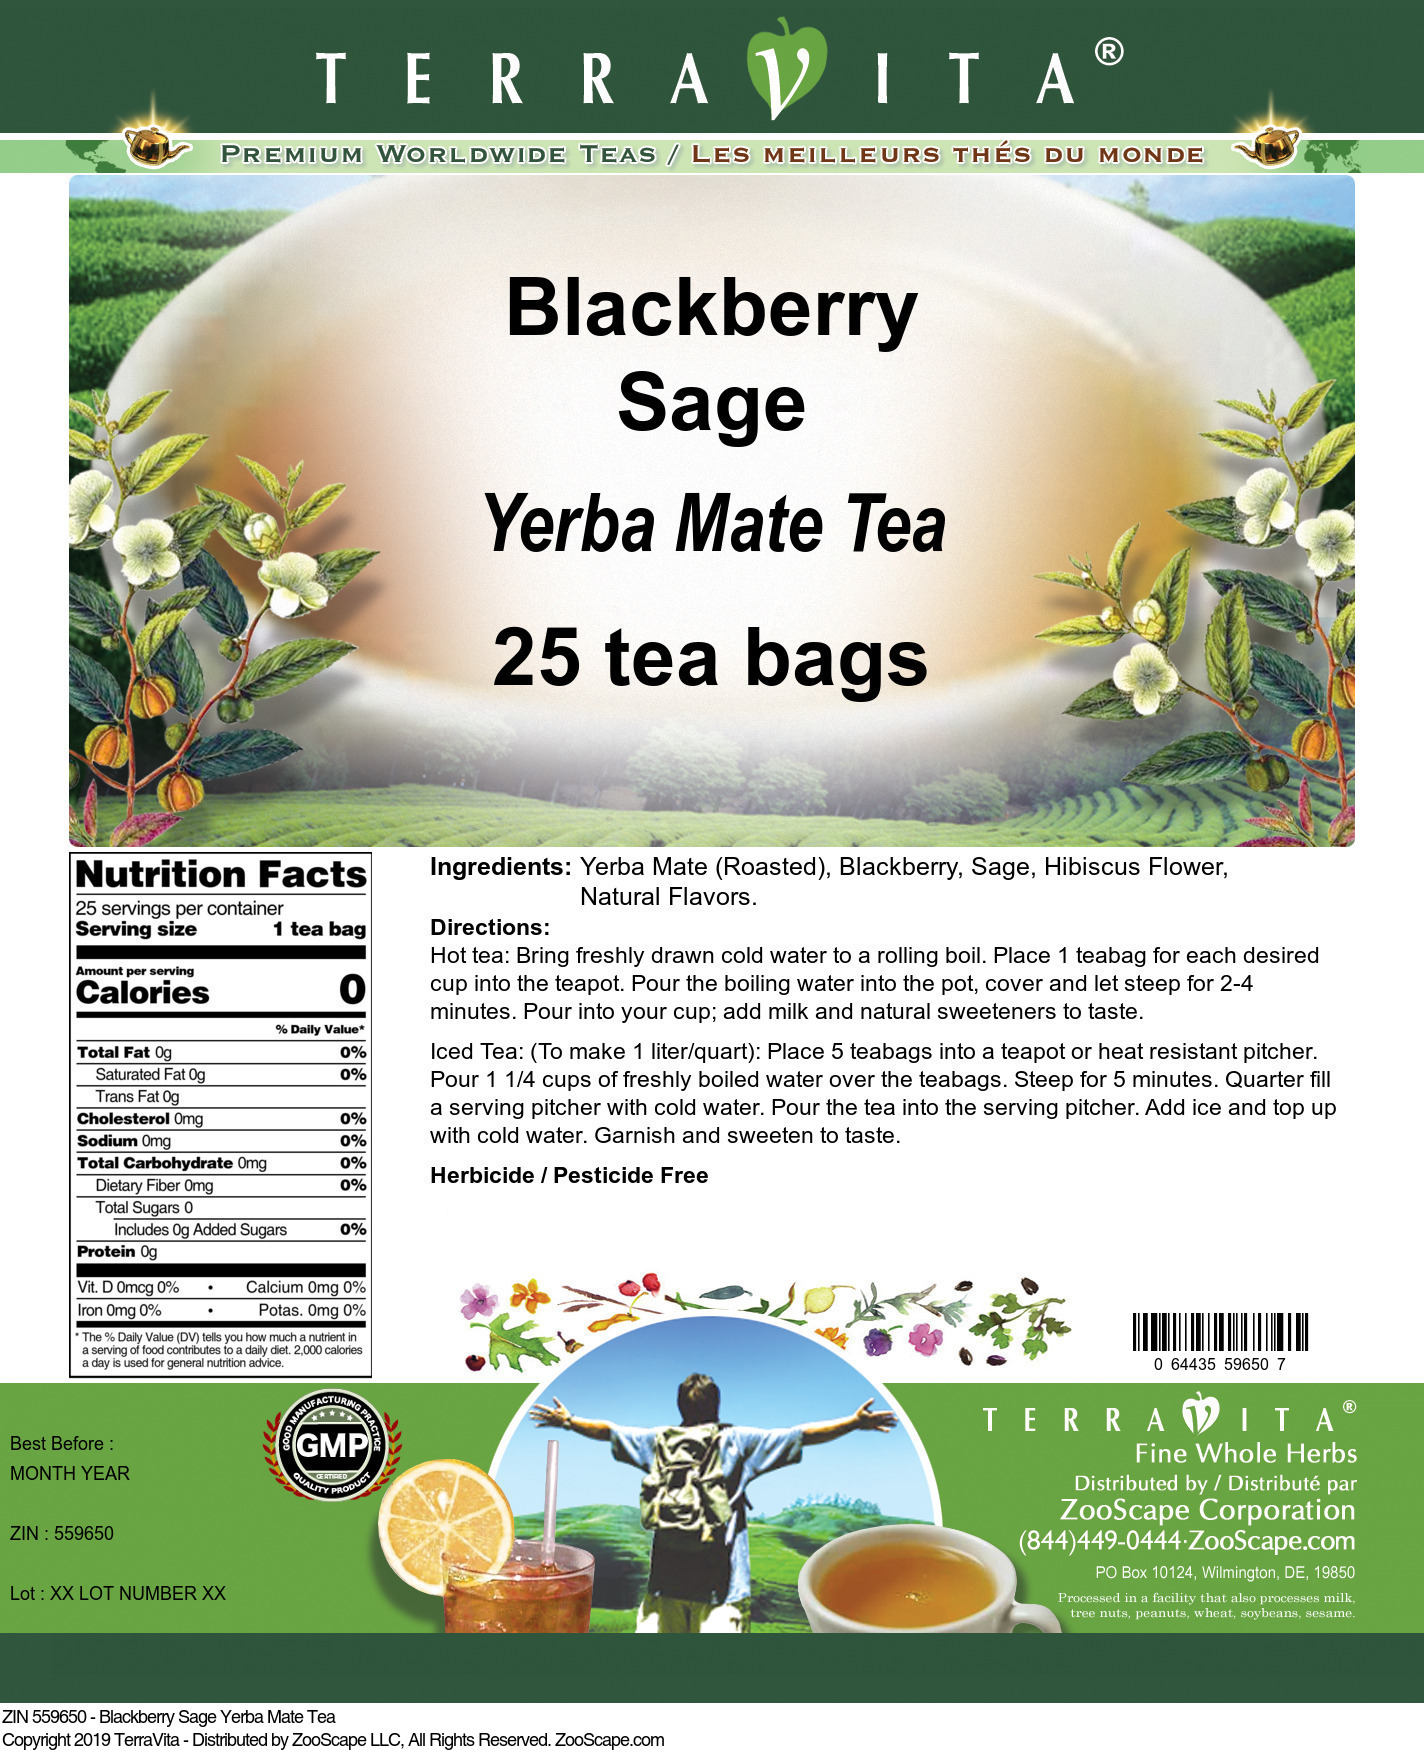 Blackberry Sage Yerba Mate